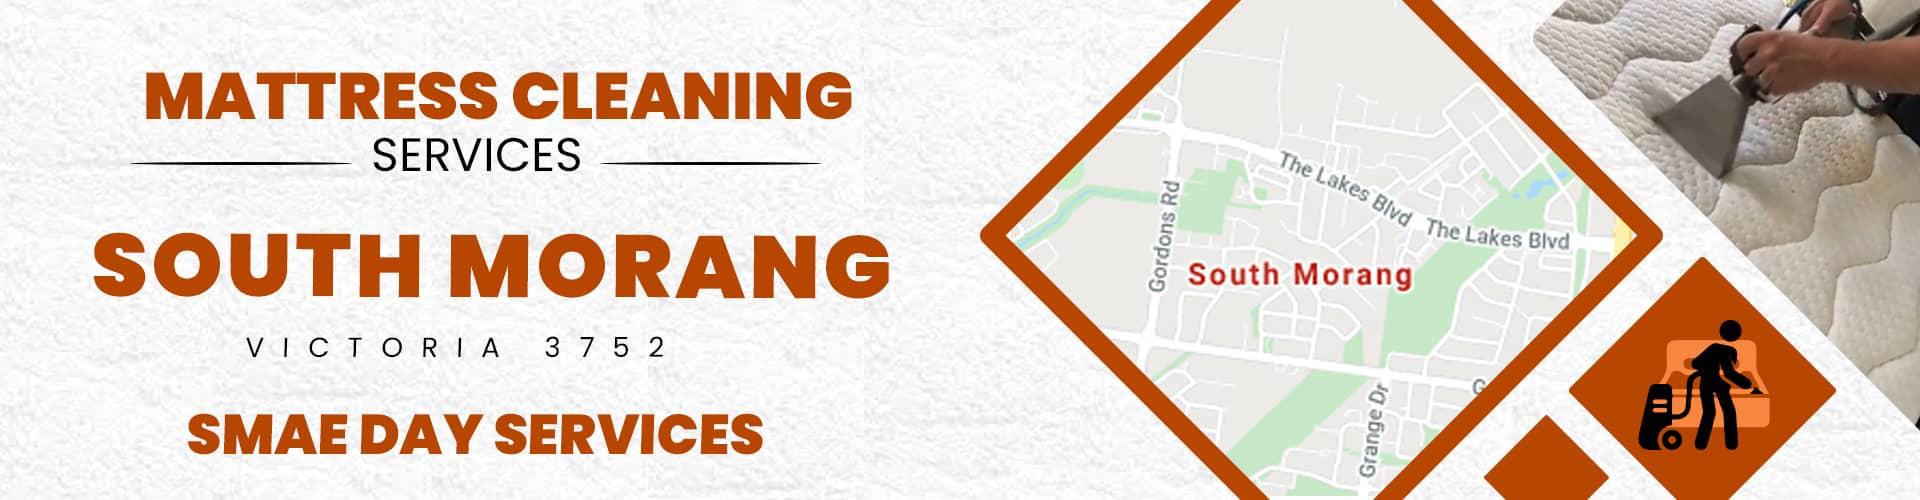 Mattress Cleaning South Morang